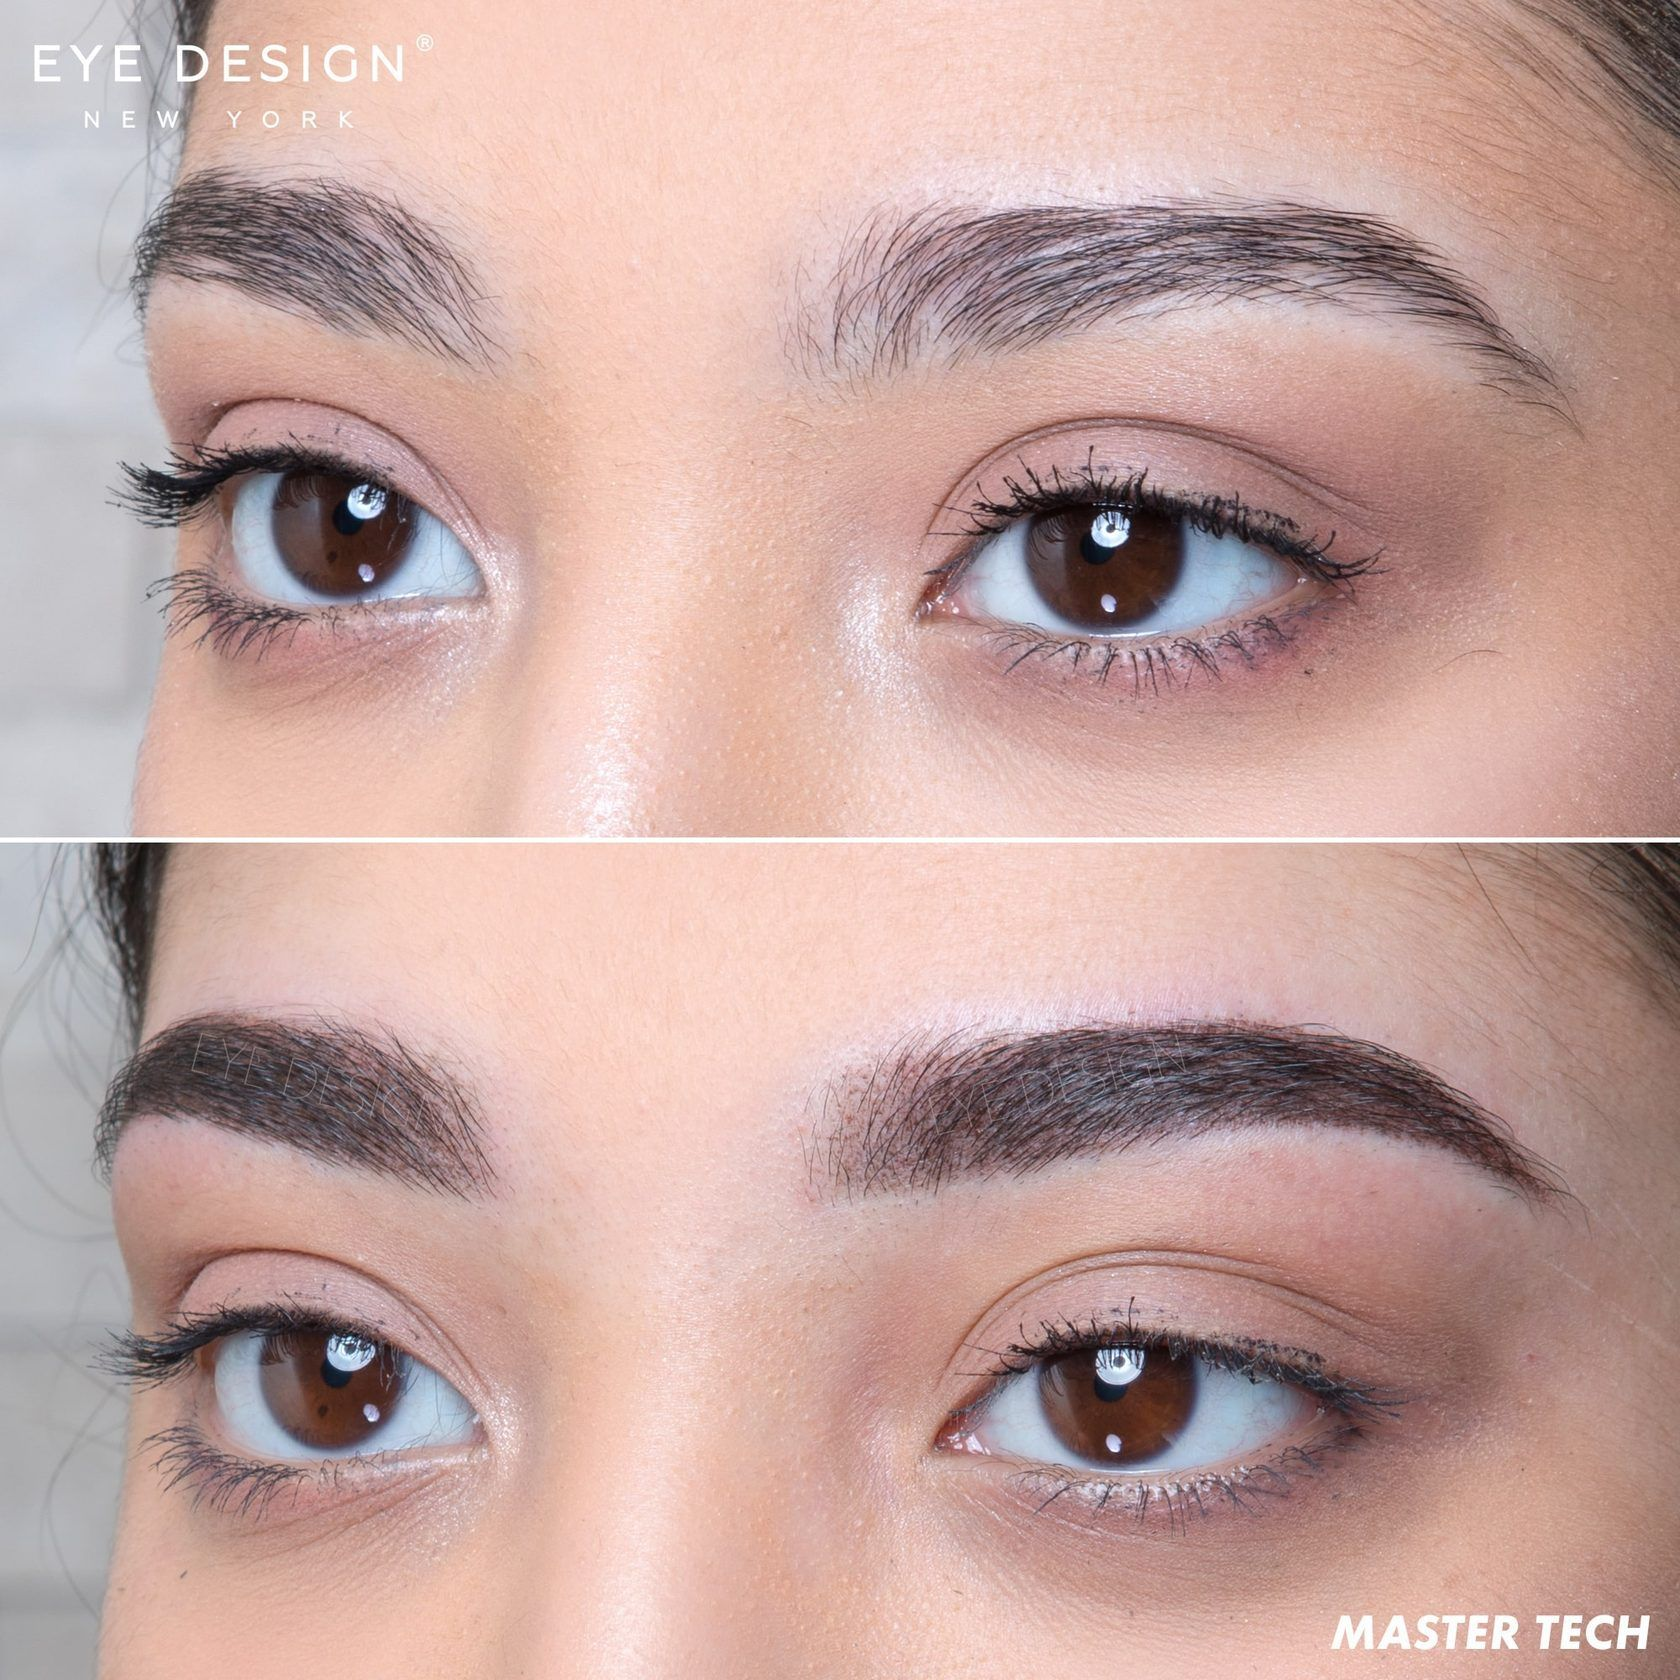 Powder Ombre Permanent Makeup Brow Solution Eye Design